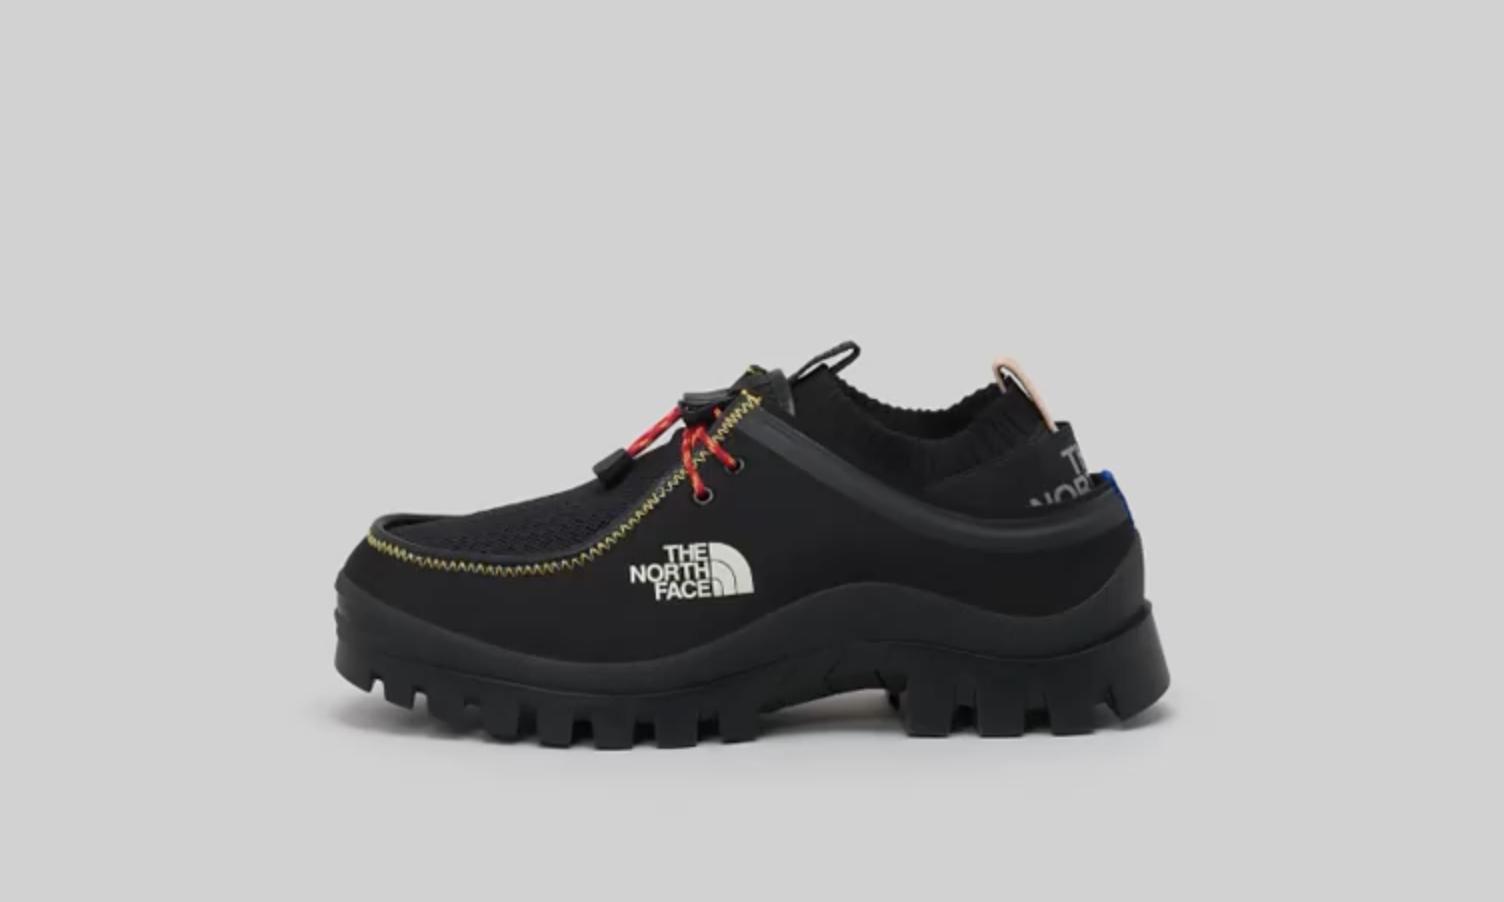 THE NORTH FACE x Hender Scheme 联名鞋款概念视频发布